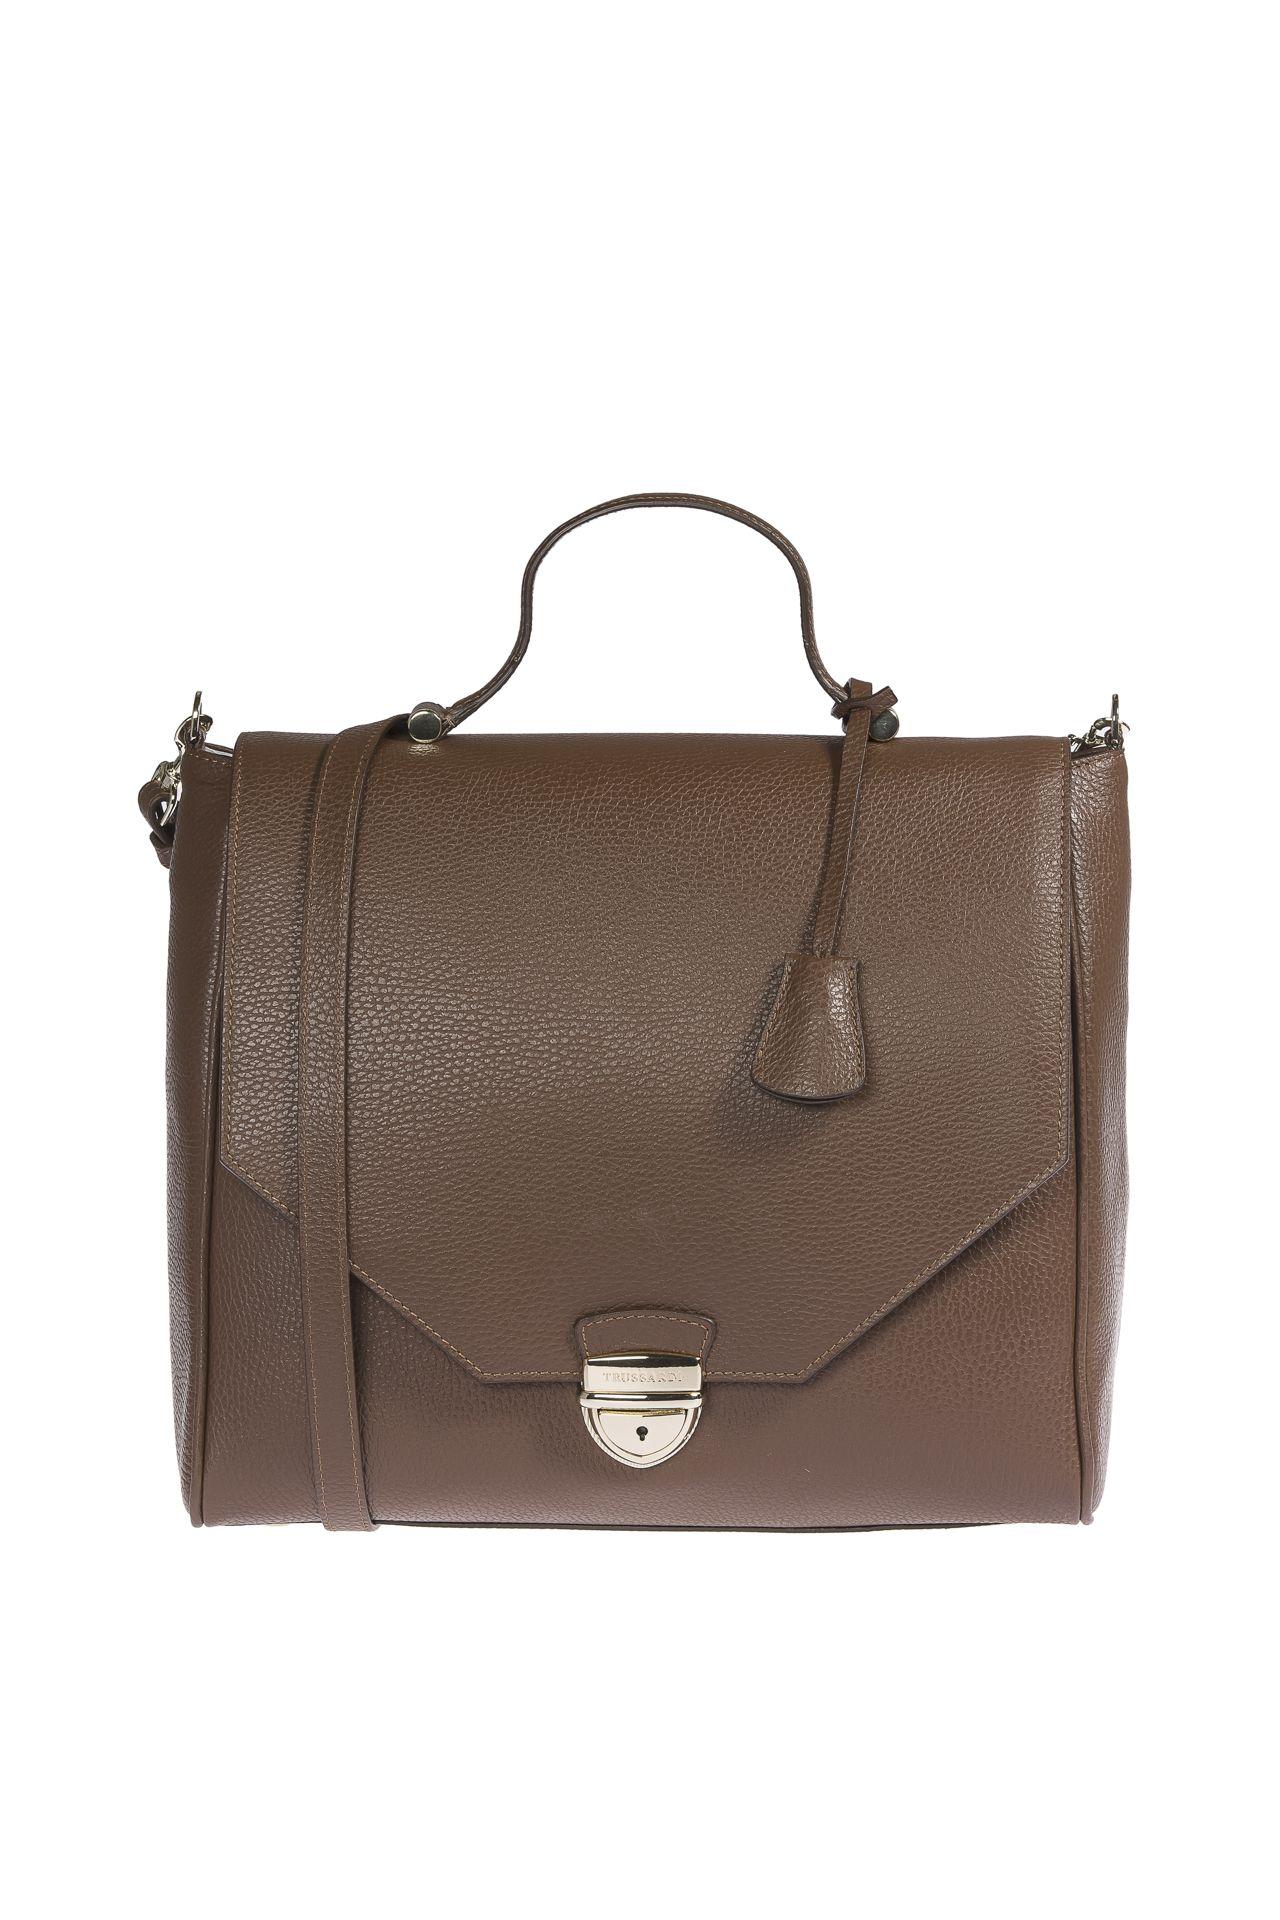 Trussardi Women's Handbag Brown 1DB338_69DarkBrown